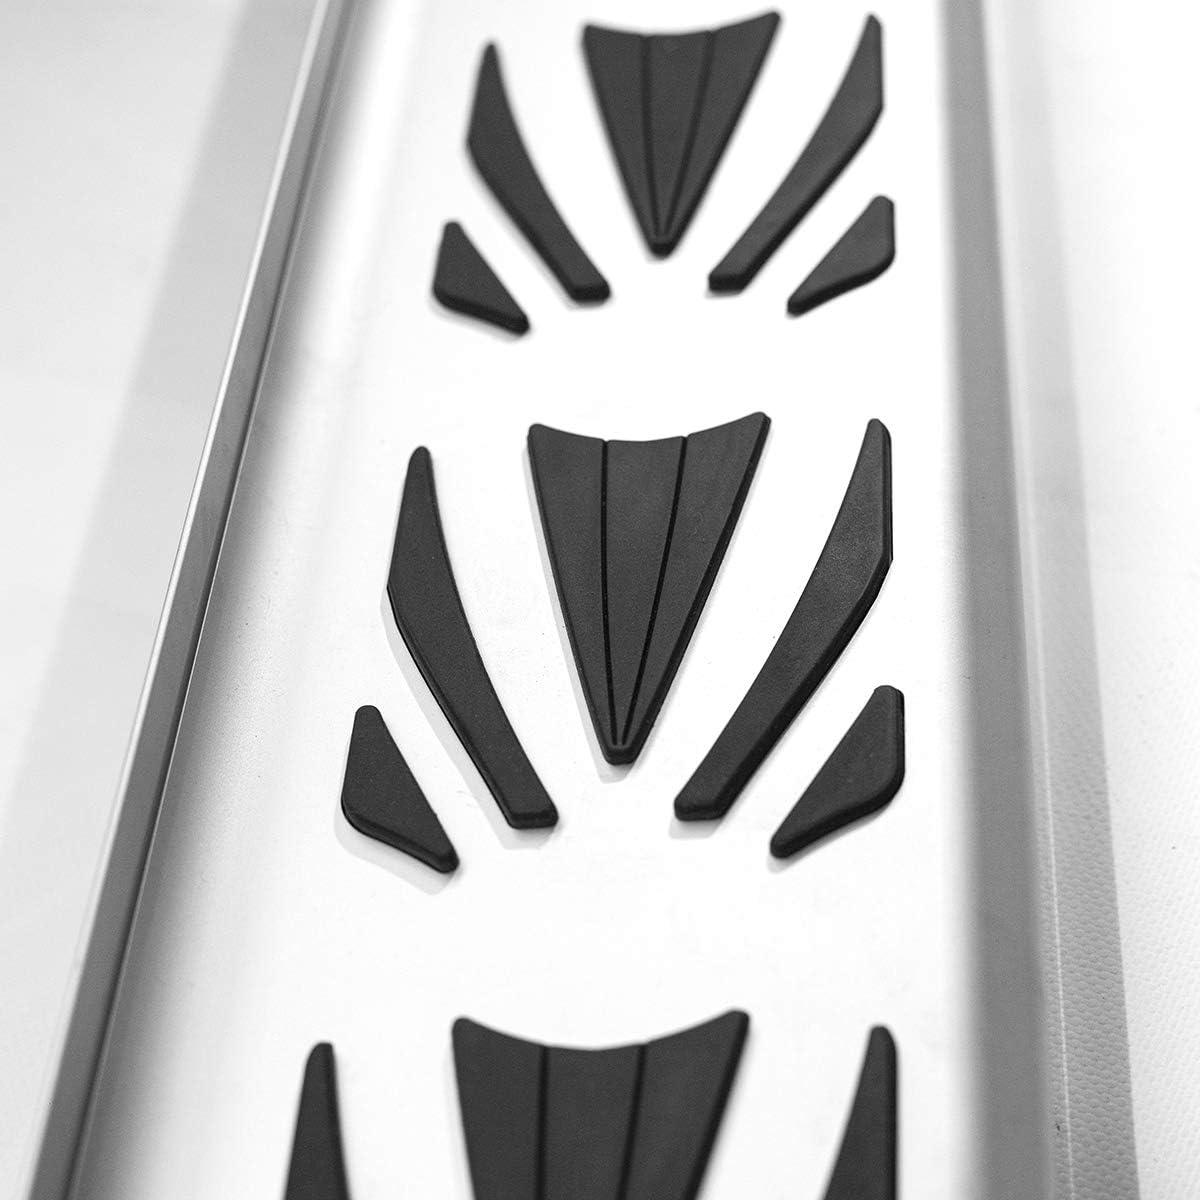 Trittbretter passend f/ür Honda CR-V ab Baujahr 2012 Model Aspendos mit T/ÜV und ABE